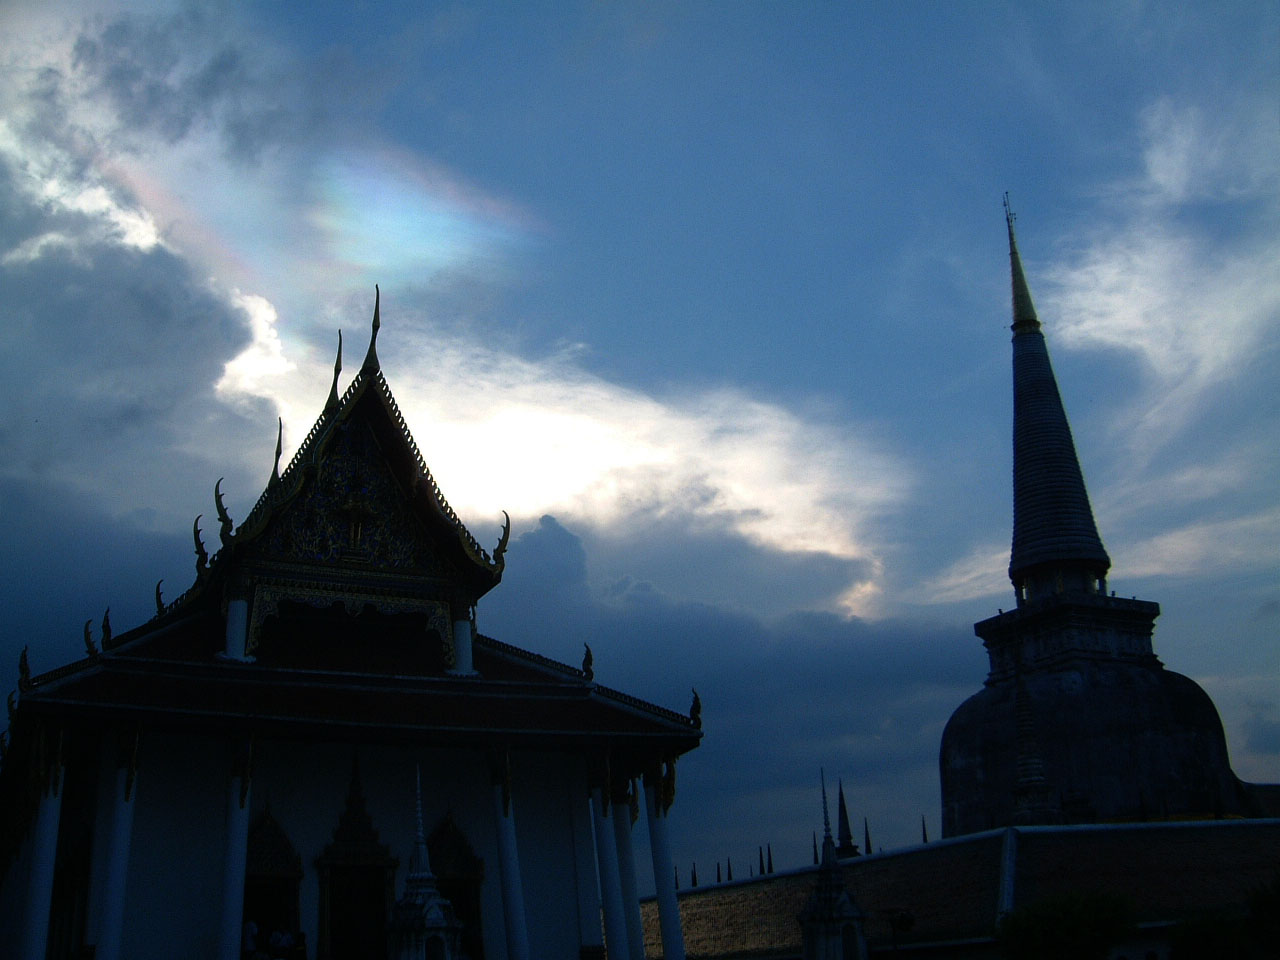 Sunset Thailand Pilgrimage 01